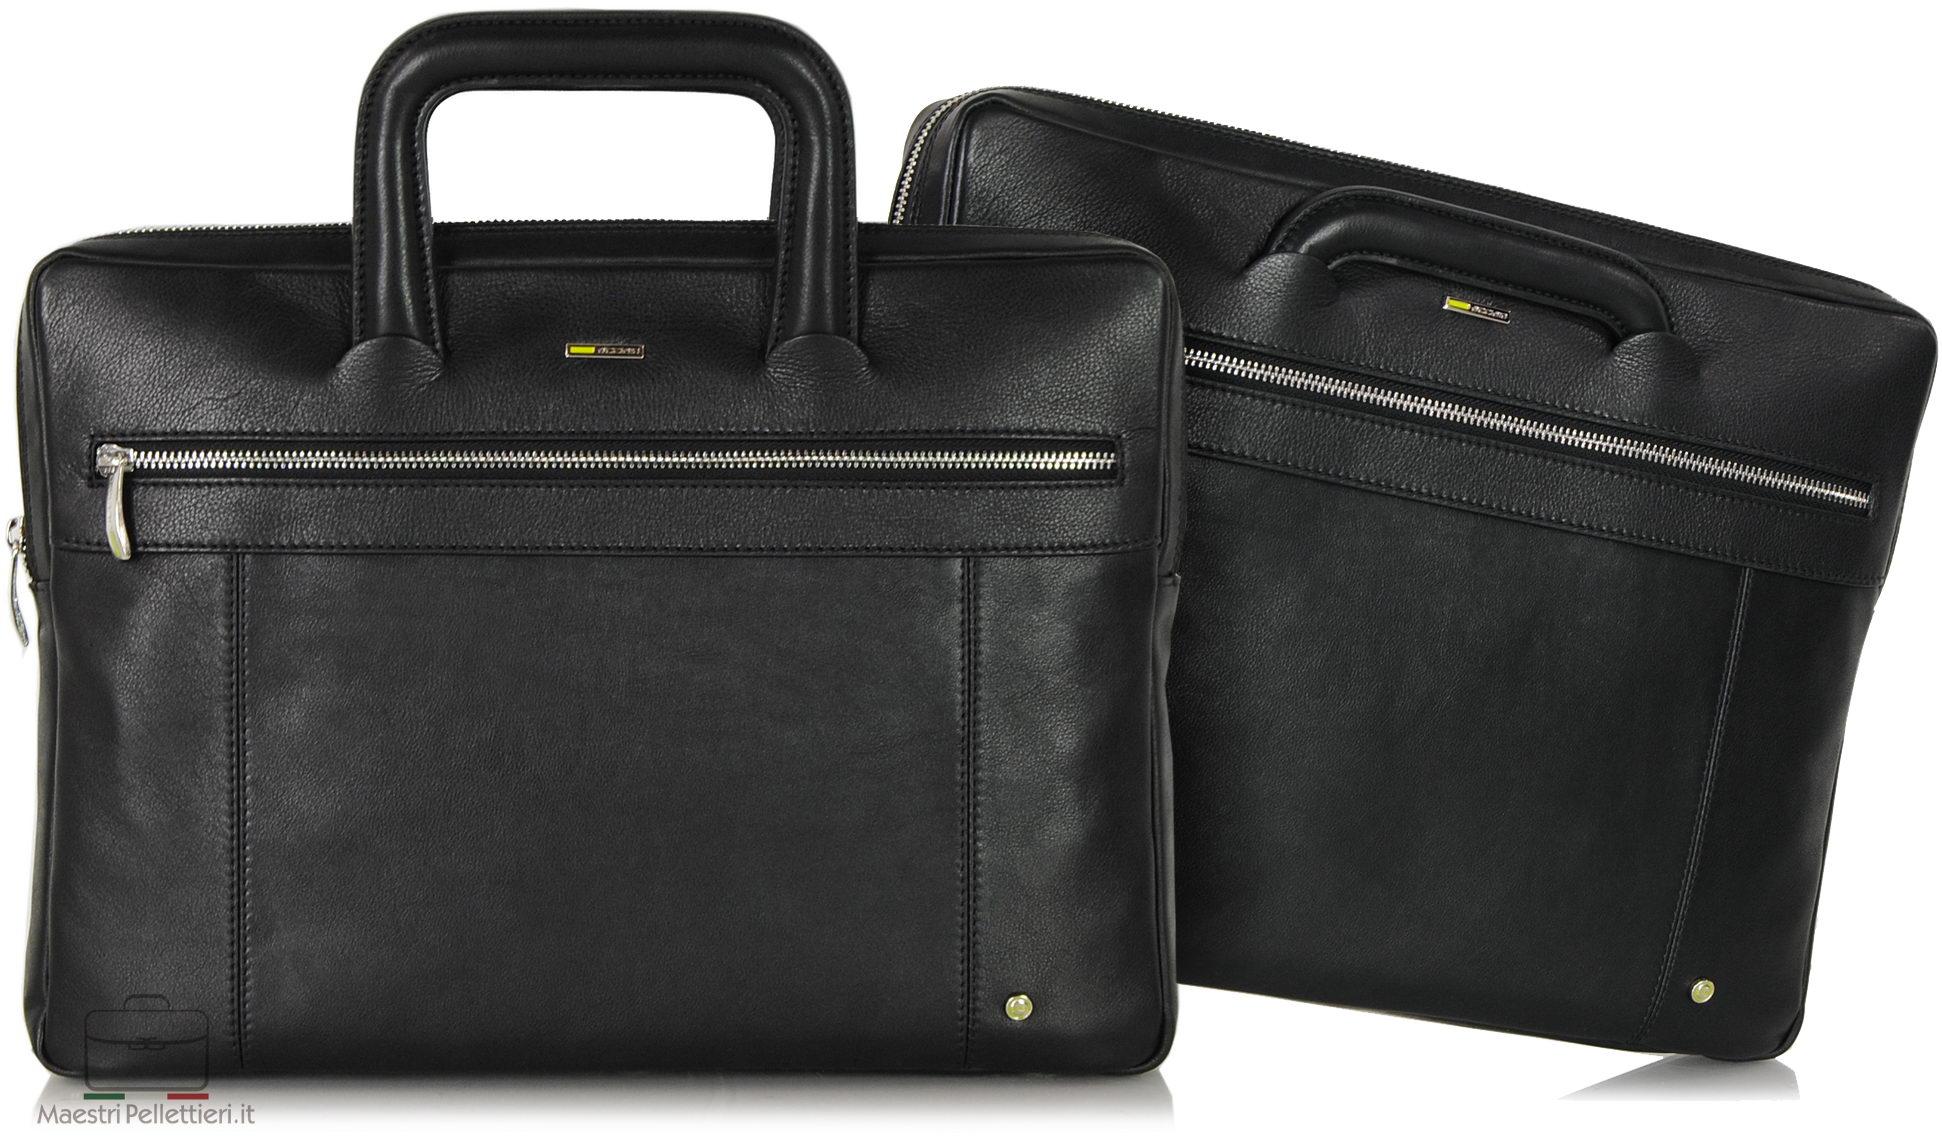 Portfolio briefcase with two handles